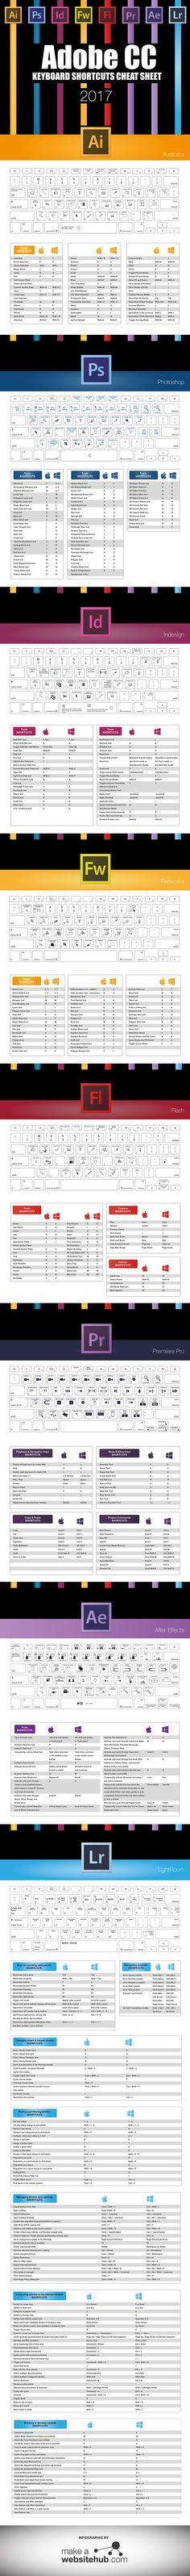 2017 Adobe Creative Cloud Keyboard Shortcuts Cheat Sheet #infographic